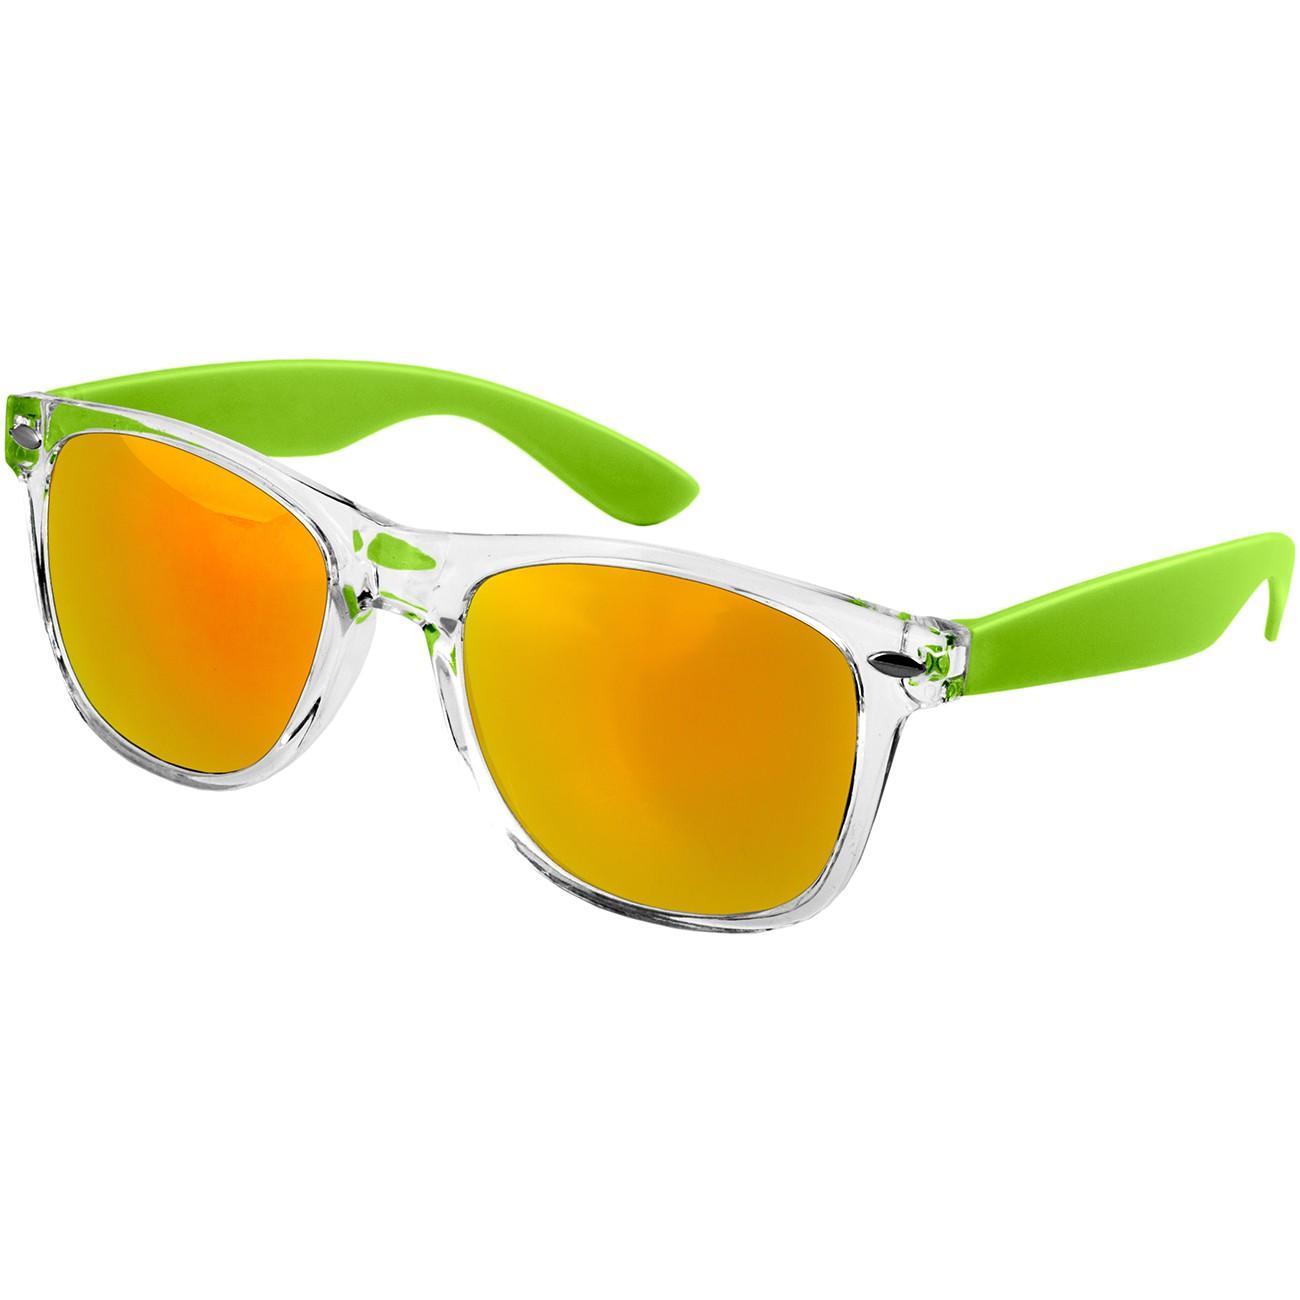 caspar damen herren wayfarer nerd brille sonnenbrille bunt. Black Bedroom Furniture Sets. Home Design Ideas